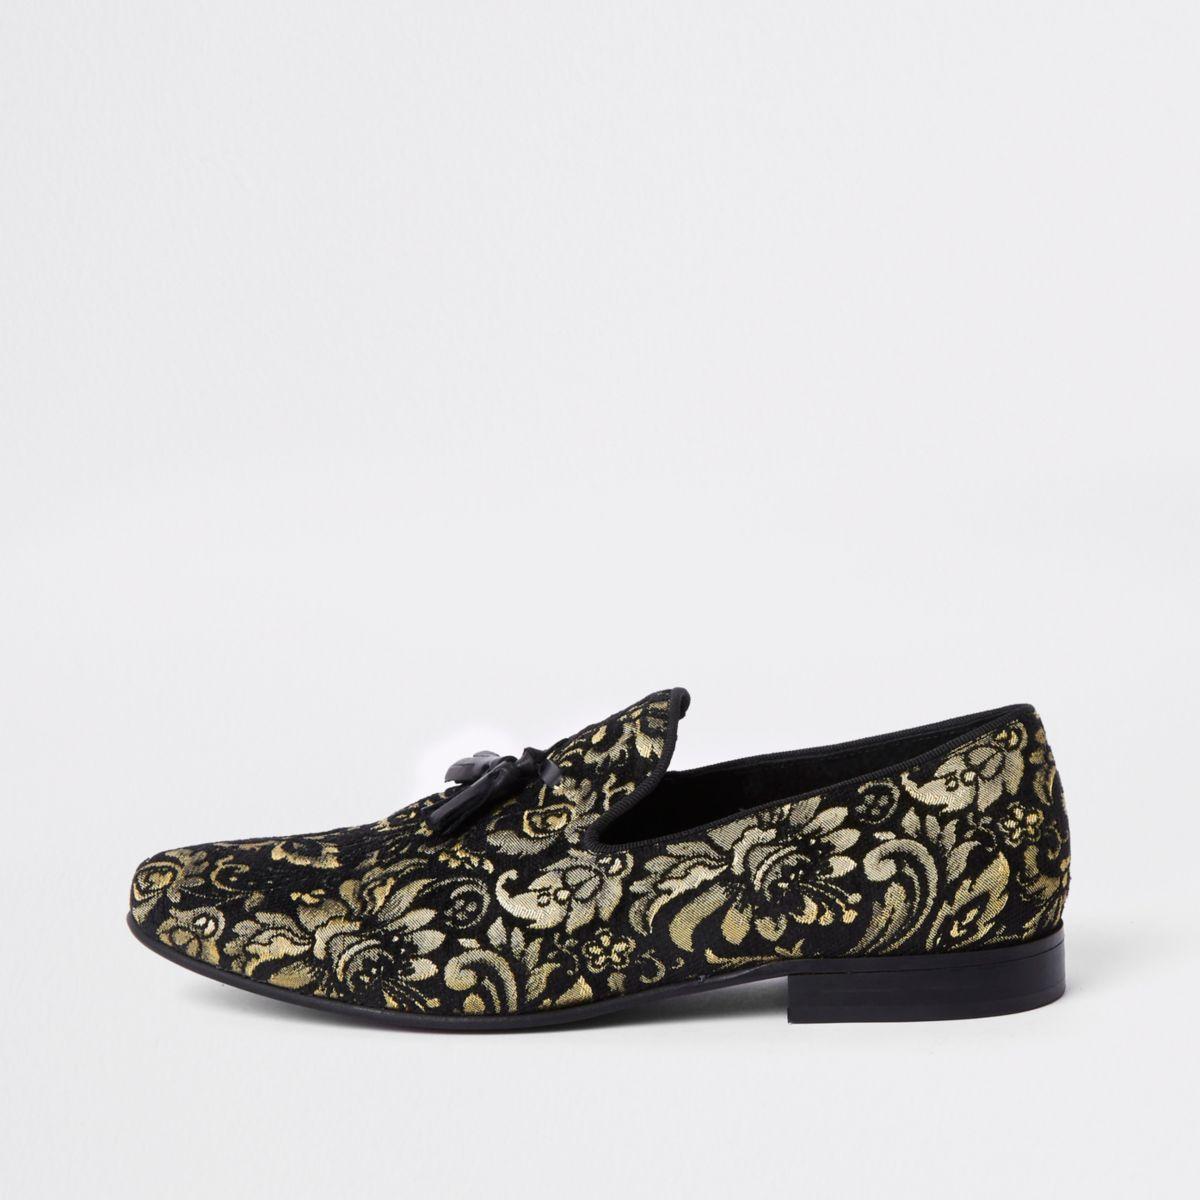 Black gold tone embroidered loafer